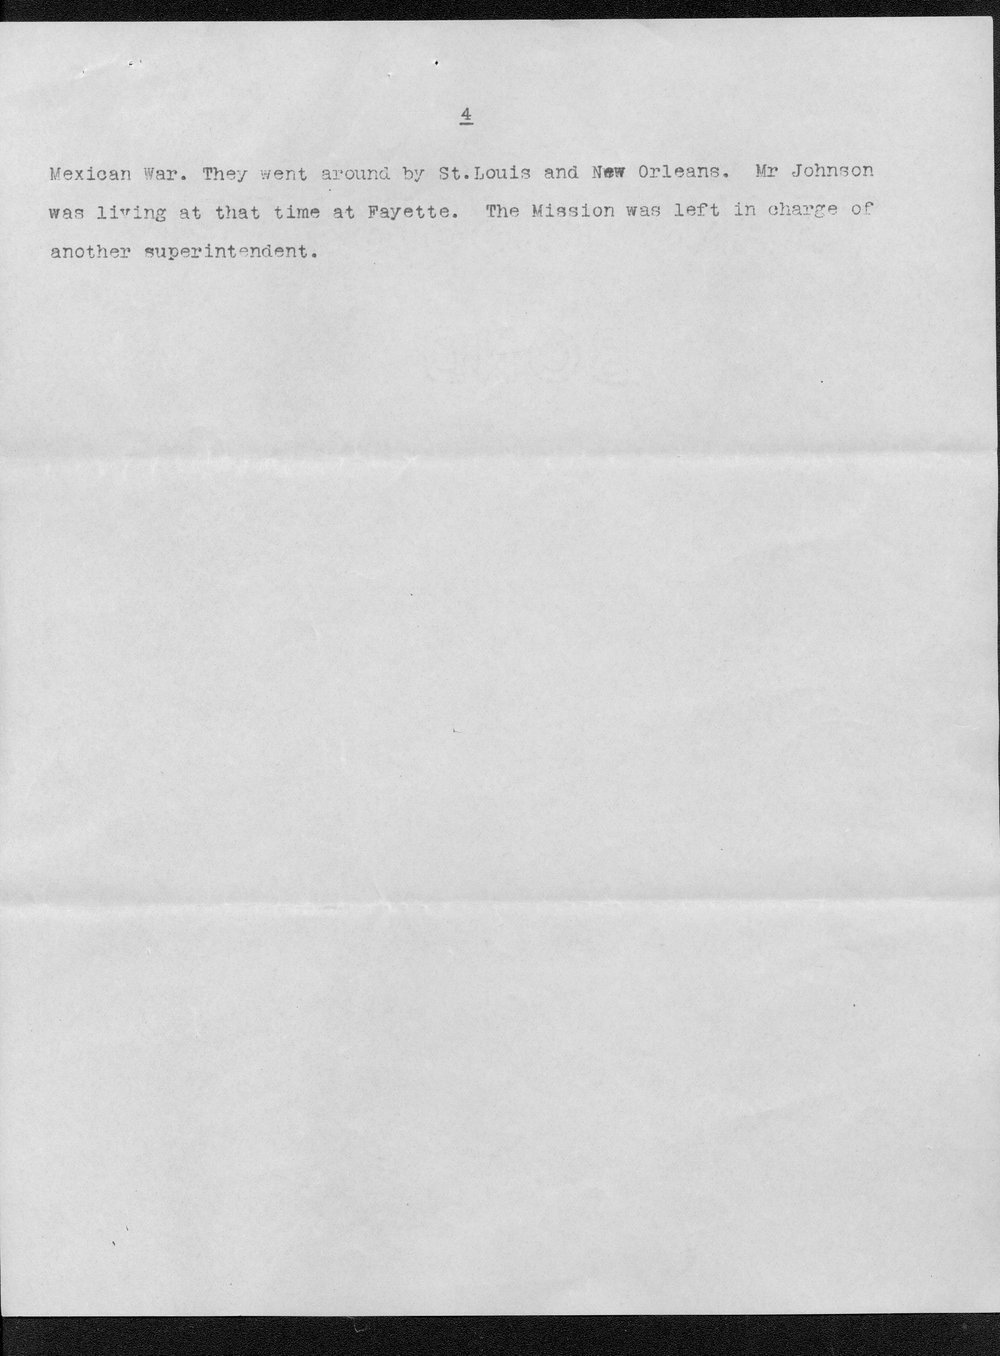 Julia Ann Stinson correspondence - 30